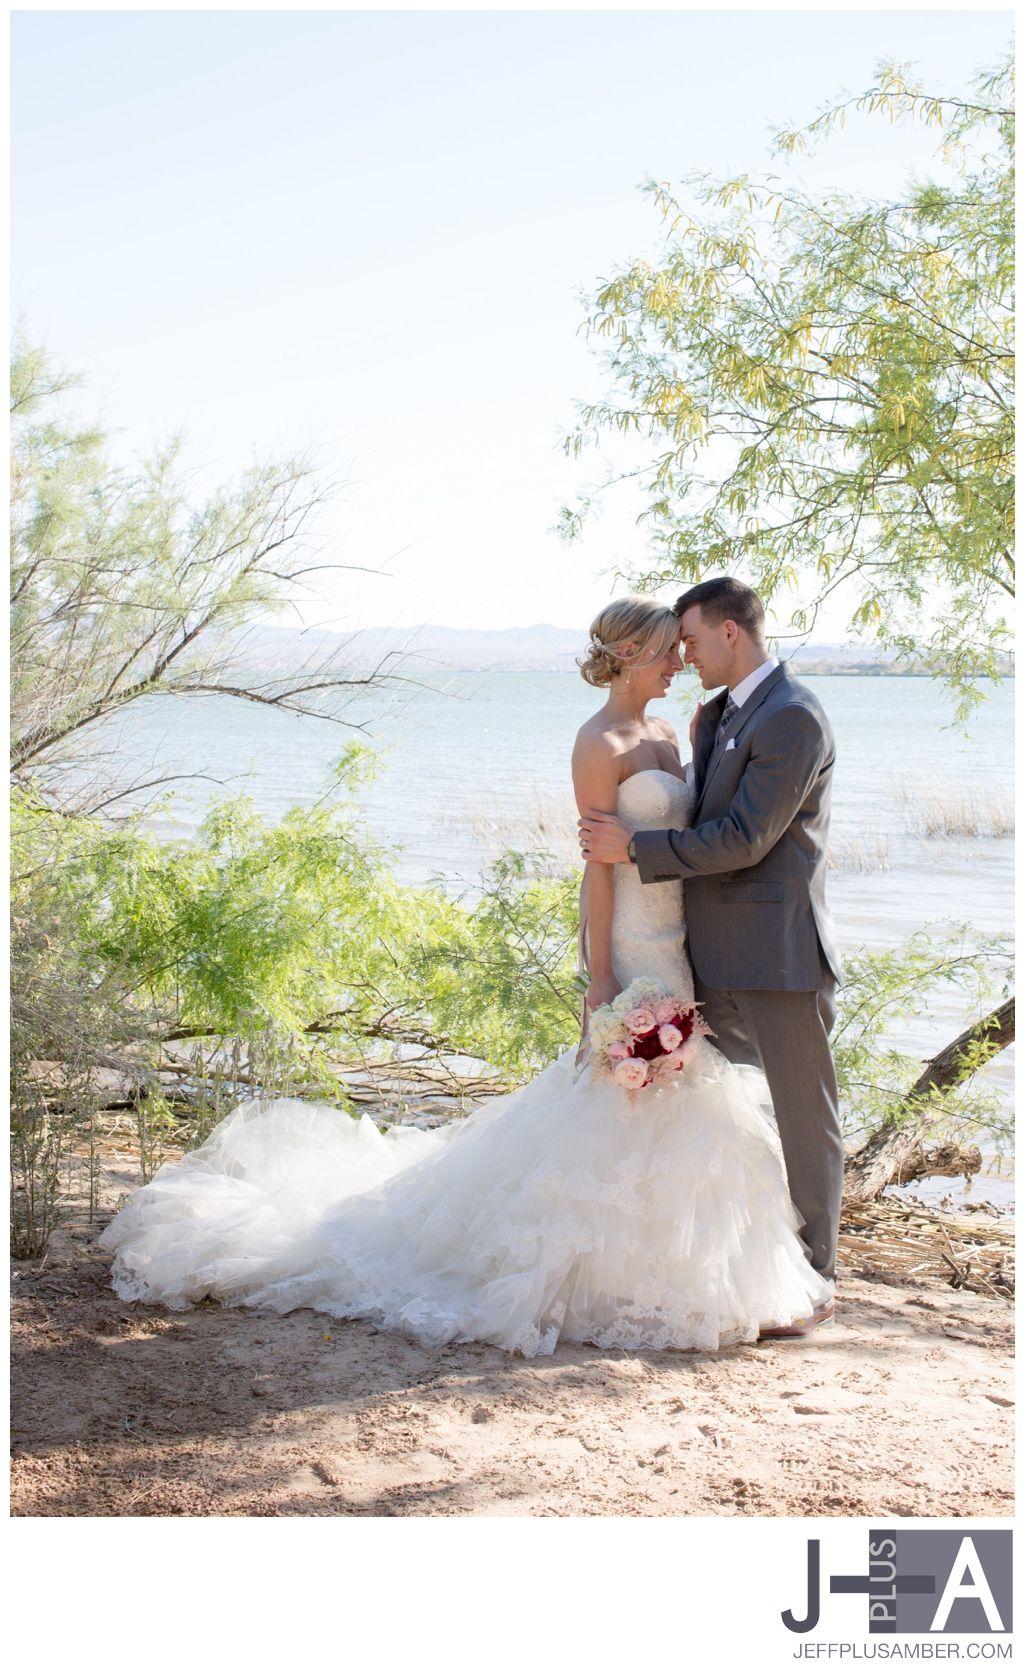 Amber Goetz pinamber goetz on behind my lense | country club wedding